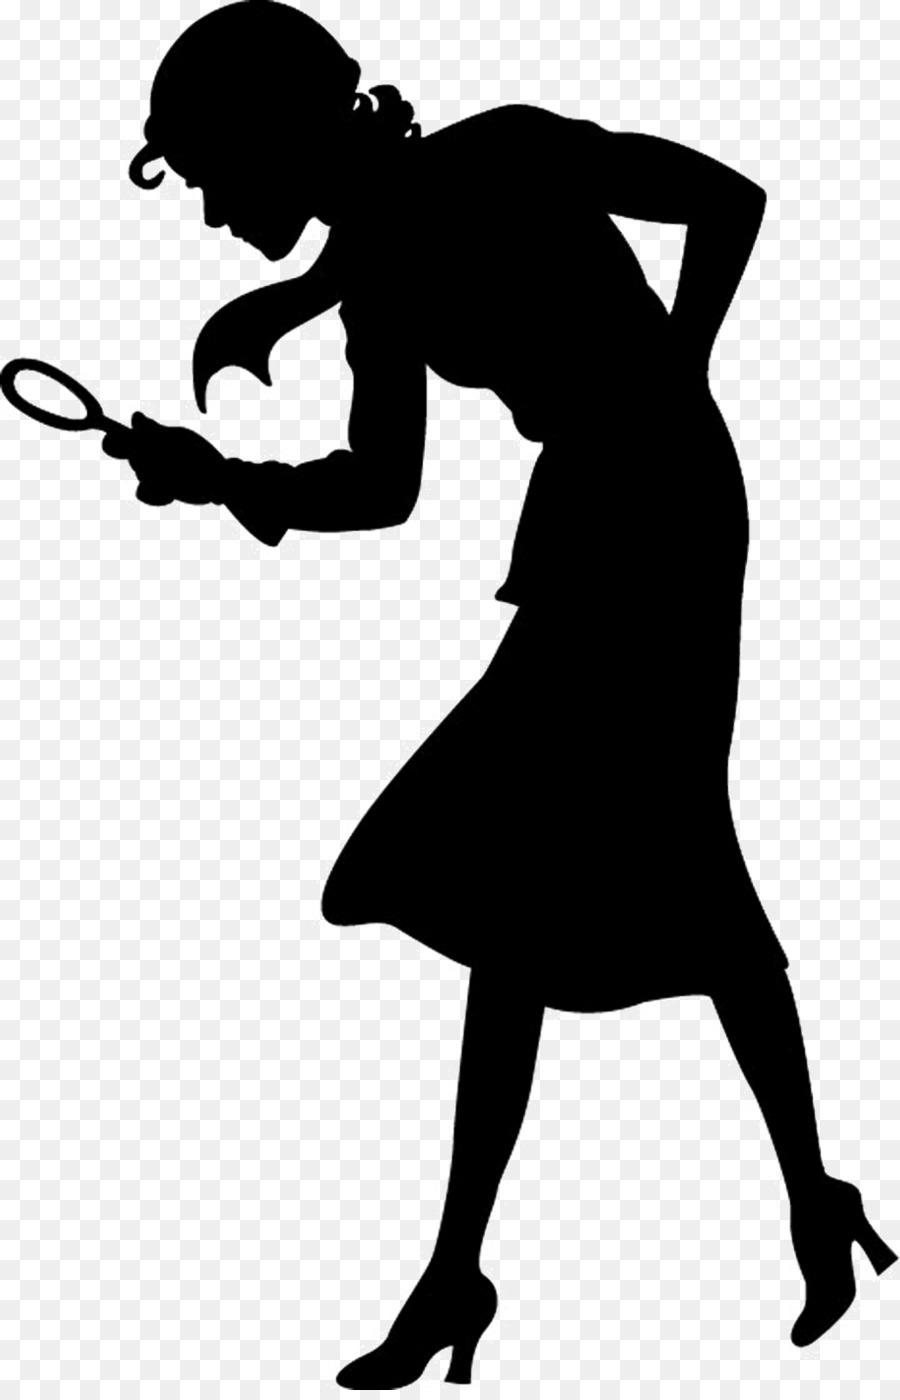 Free Female Spy Silhouette Clip Art, Download Free Clip Art.